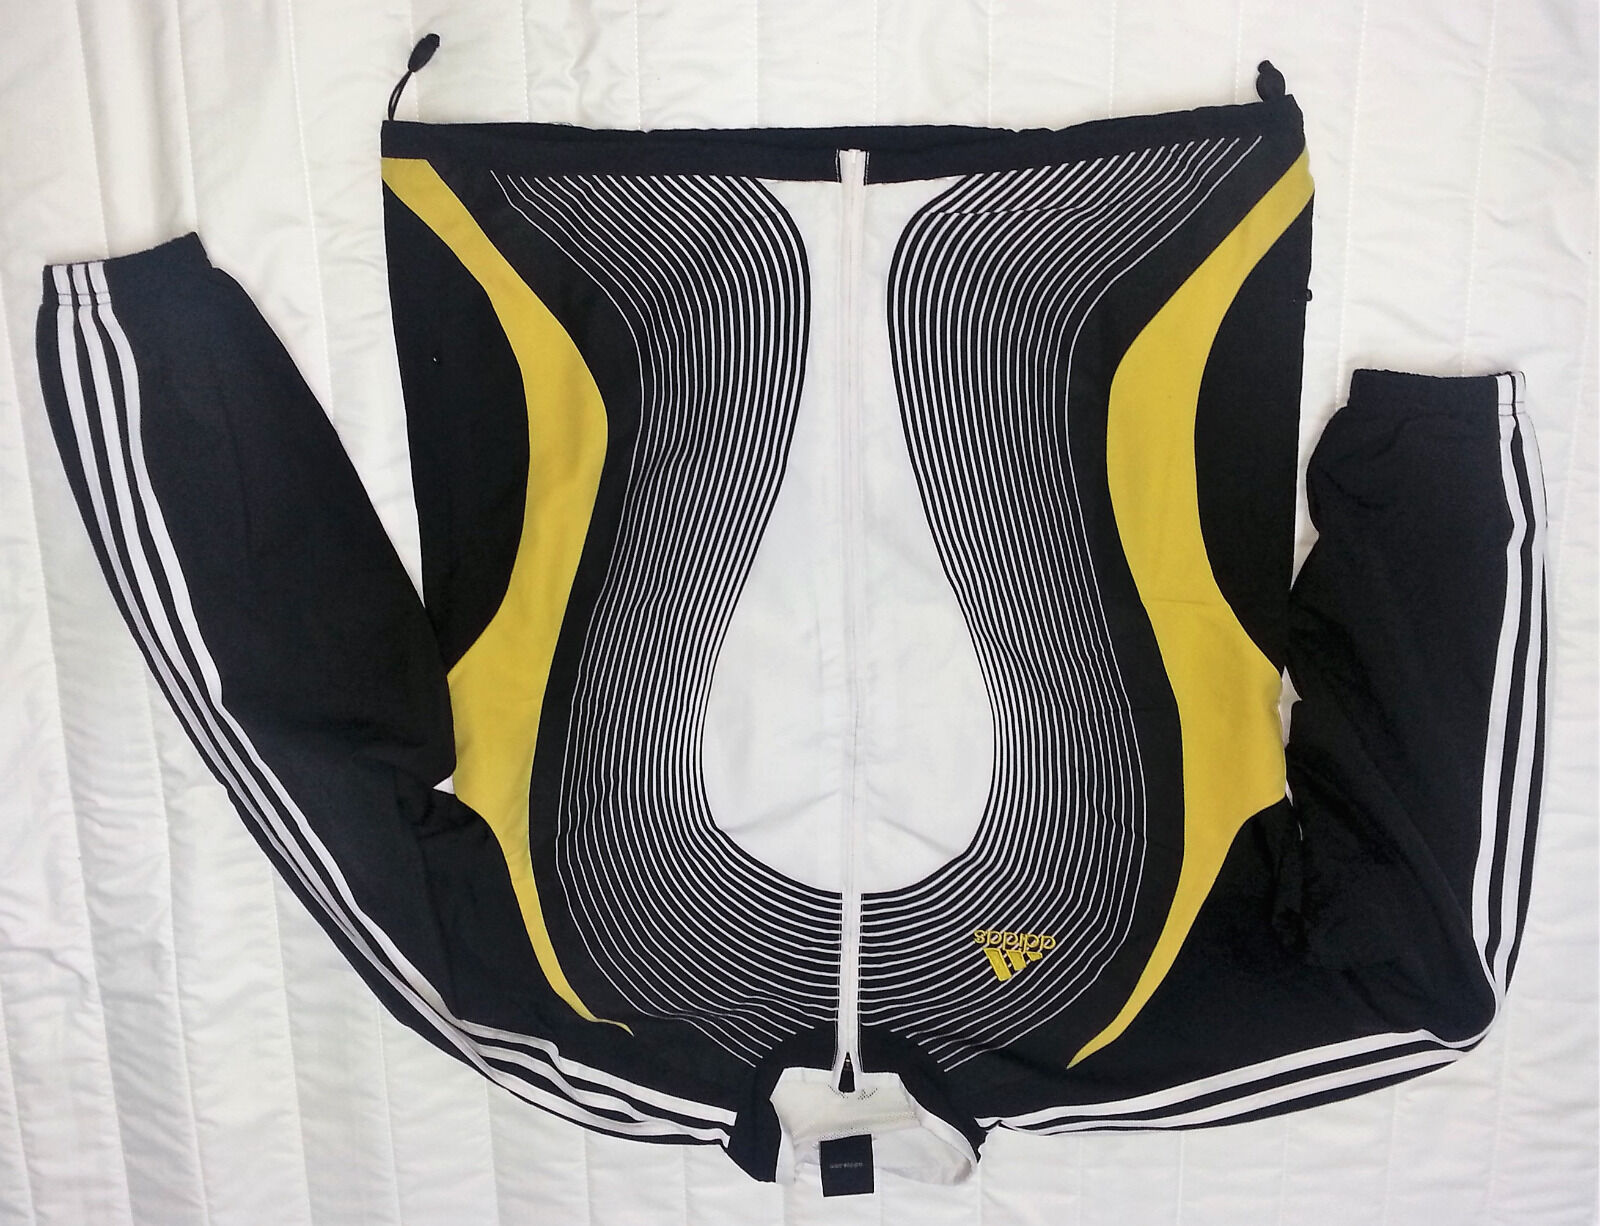 Adidas Jacke Handball Präsentation Präsentationsanzug 745520 schwarz weiß Gold